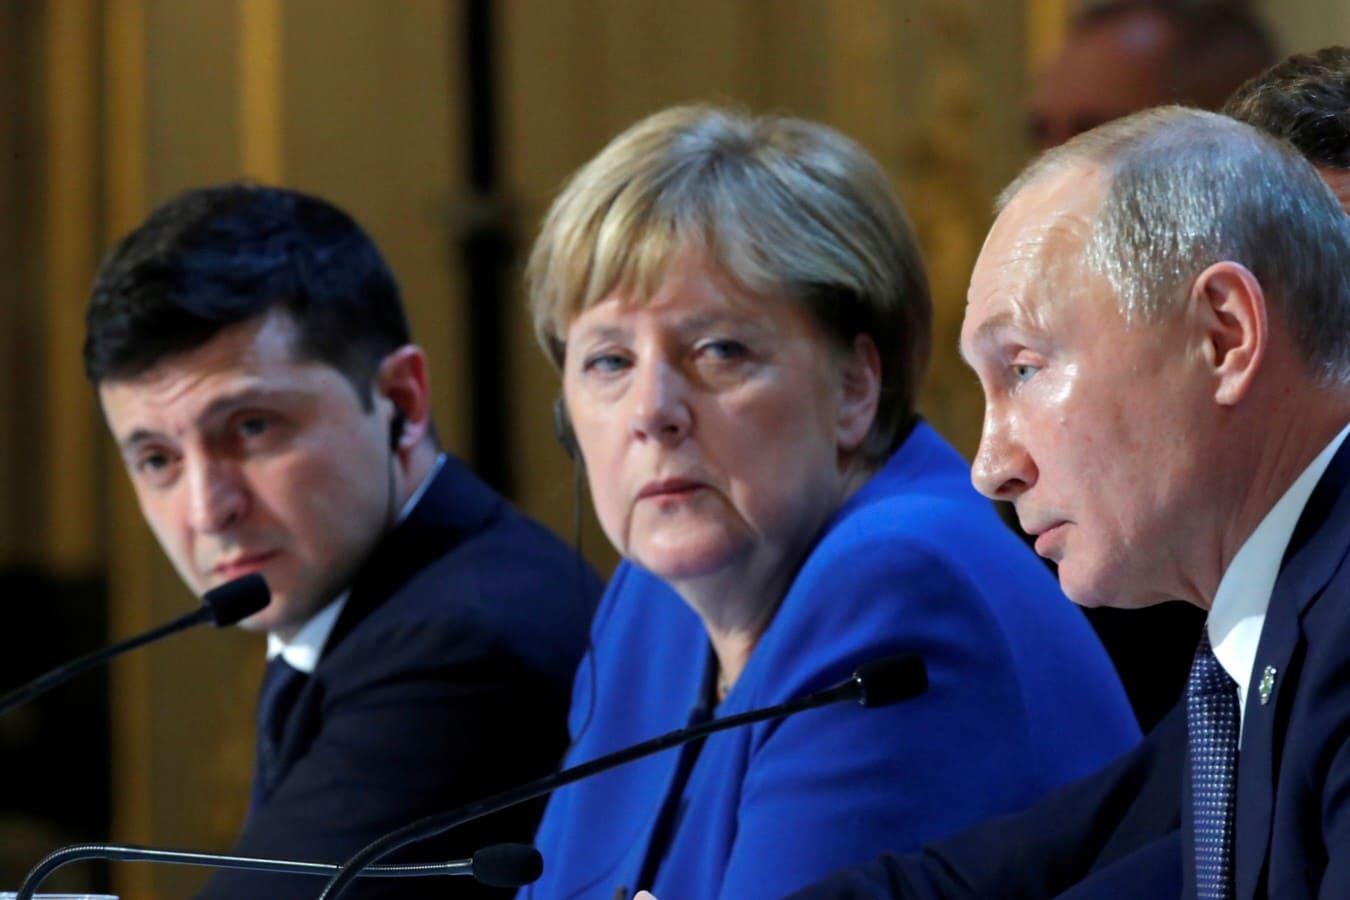 Взгляд немцев на Главу Кремля Путина и саммит 4.